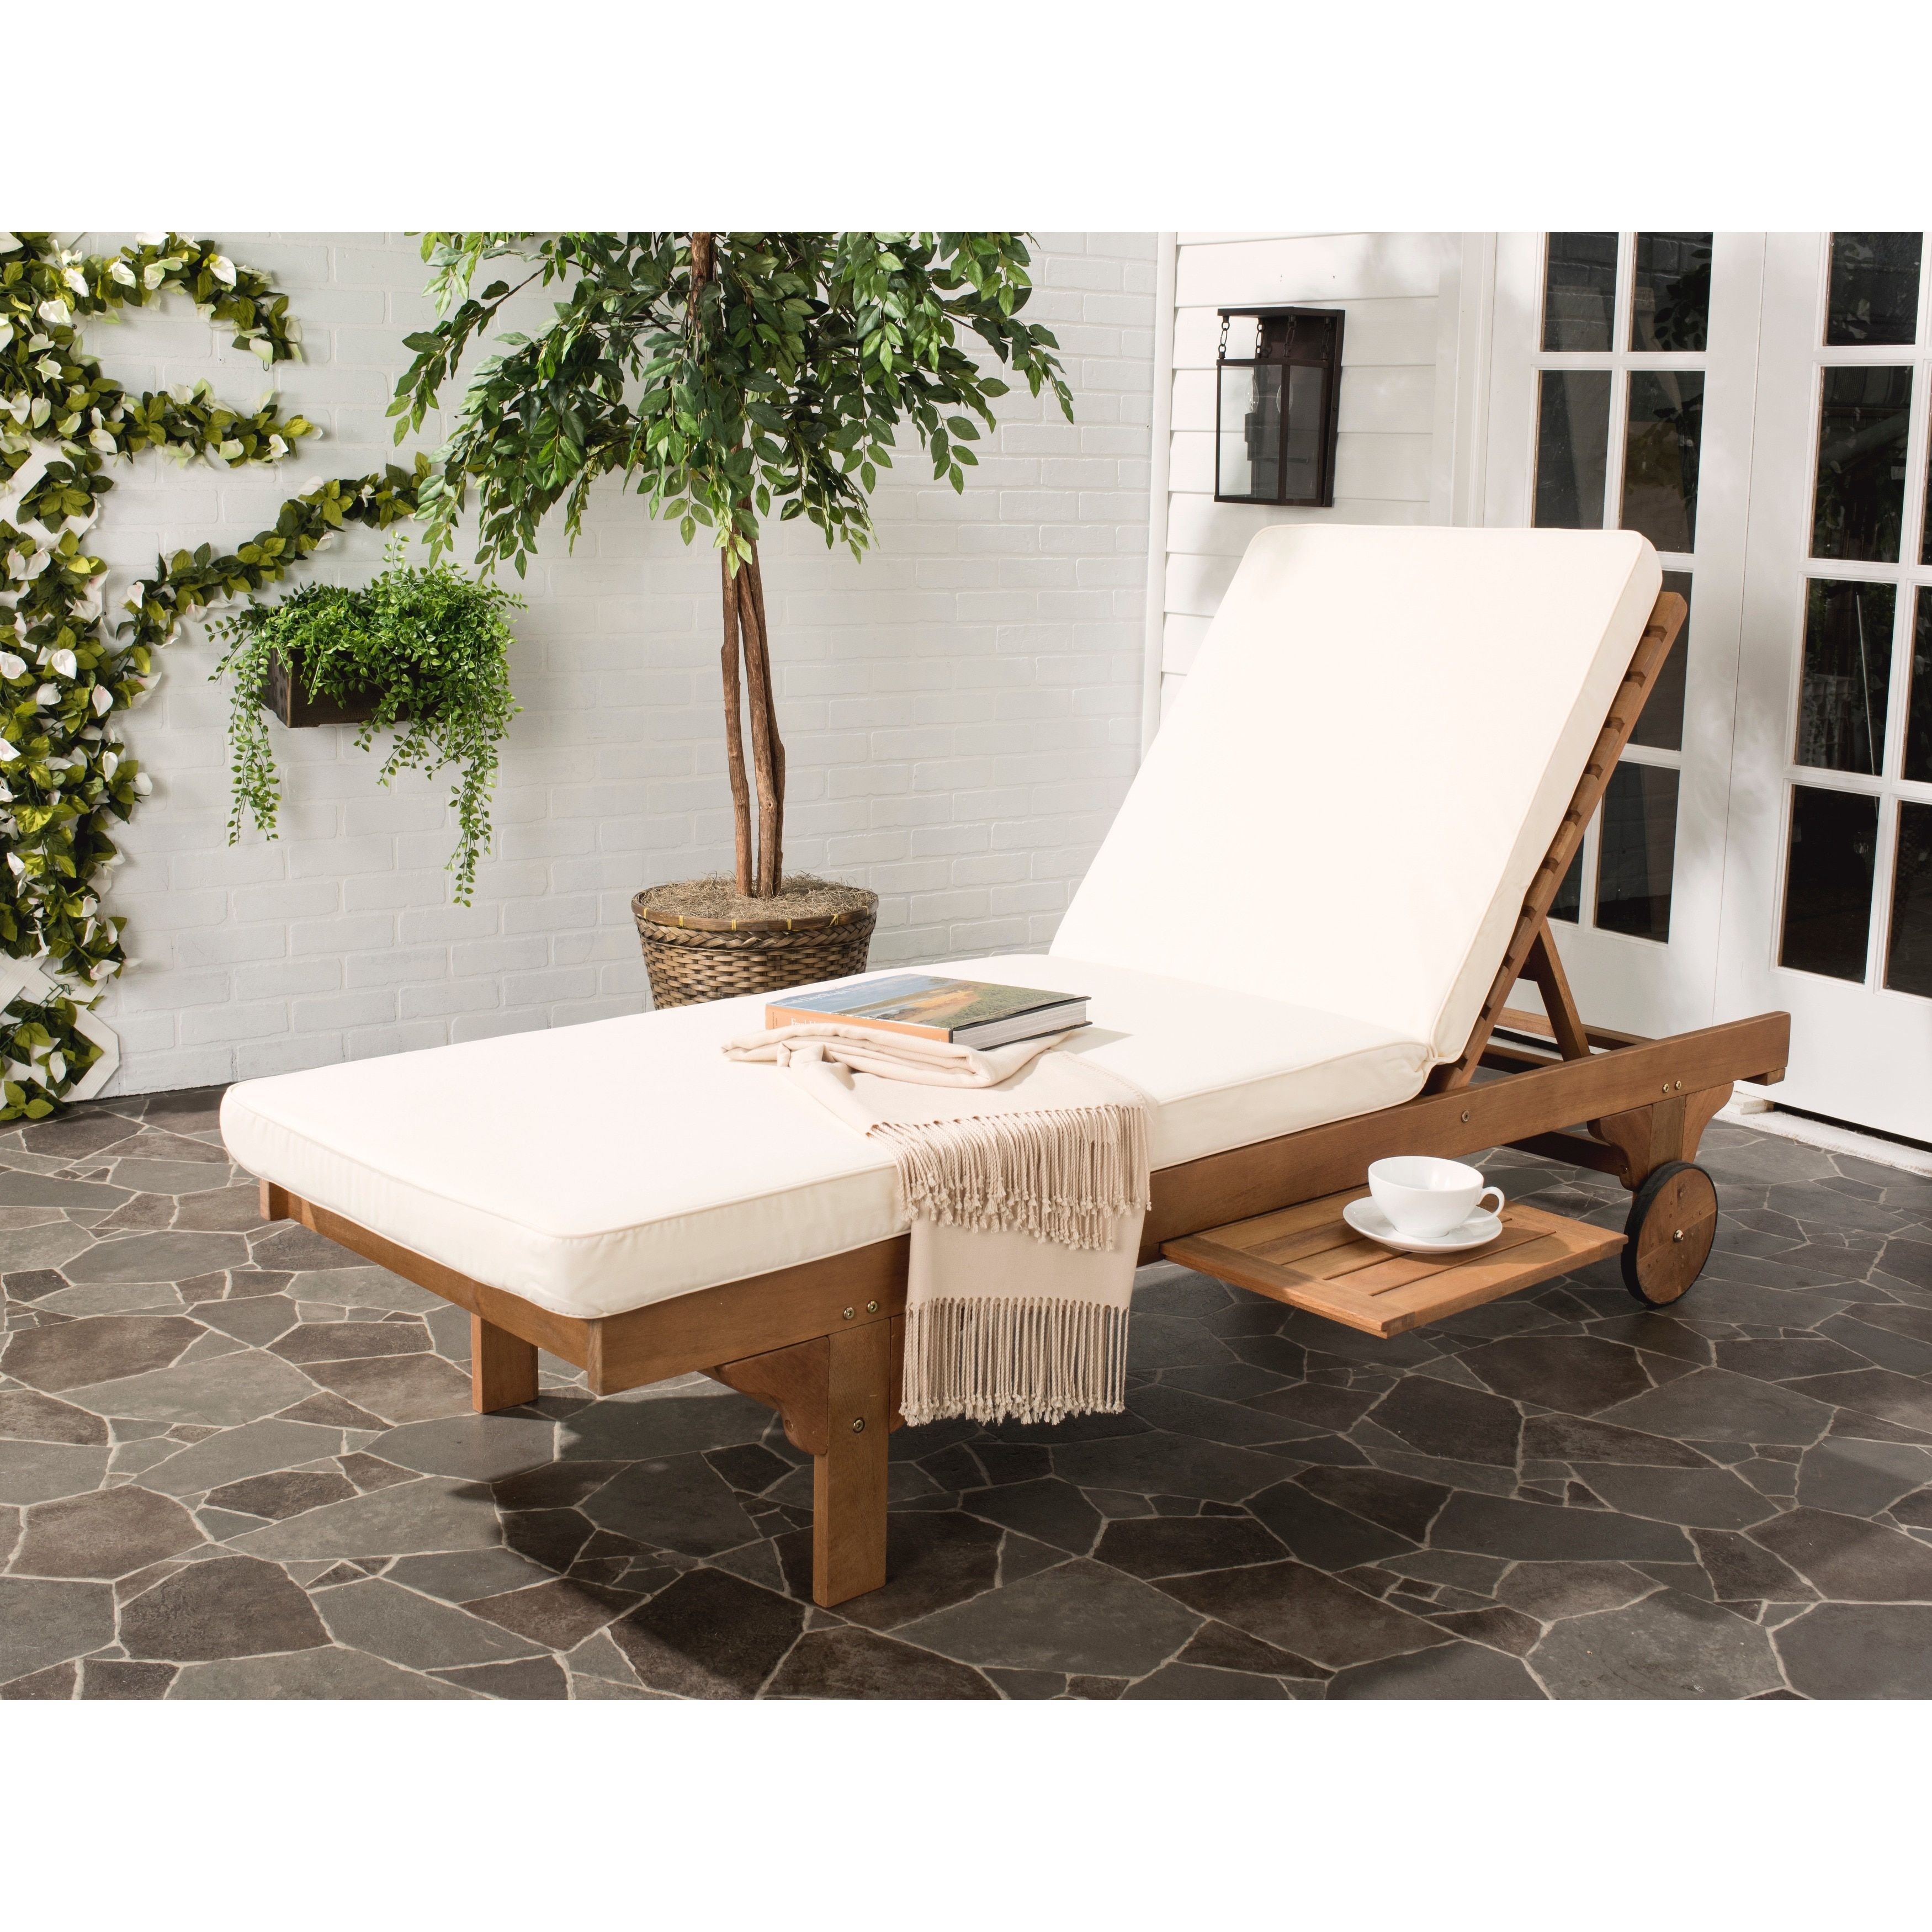 newport rocking chair stand up desk high safavieh outdoor living teak brown beige